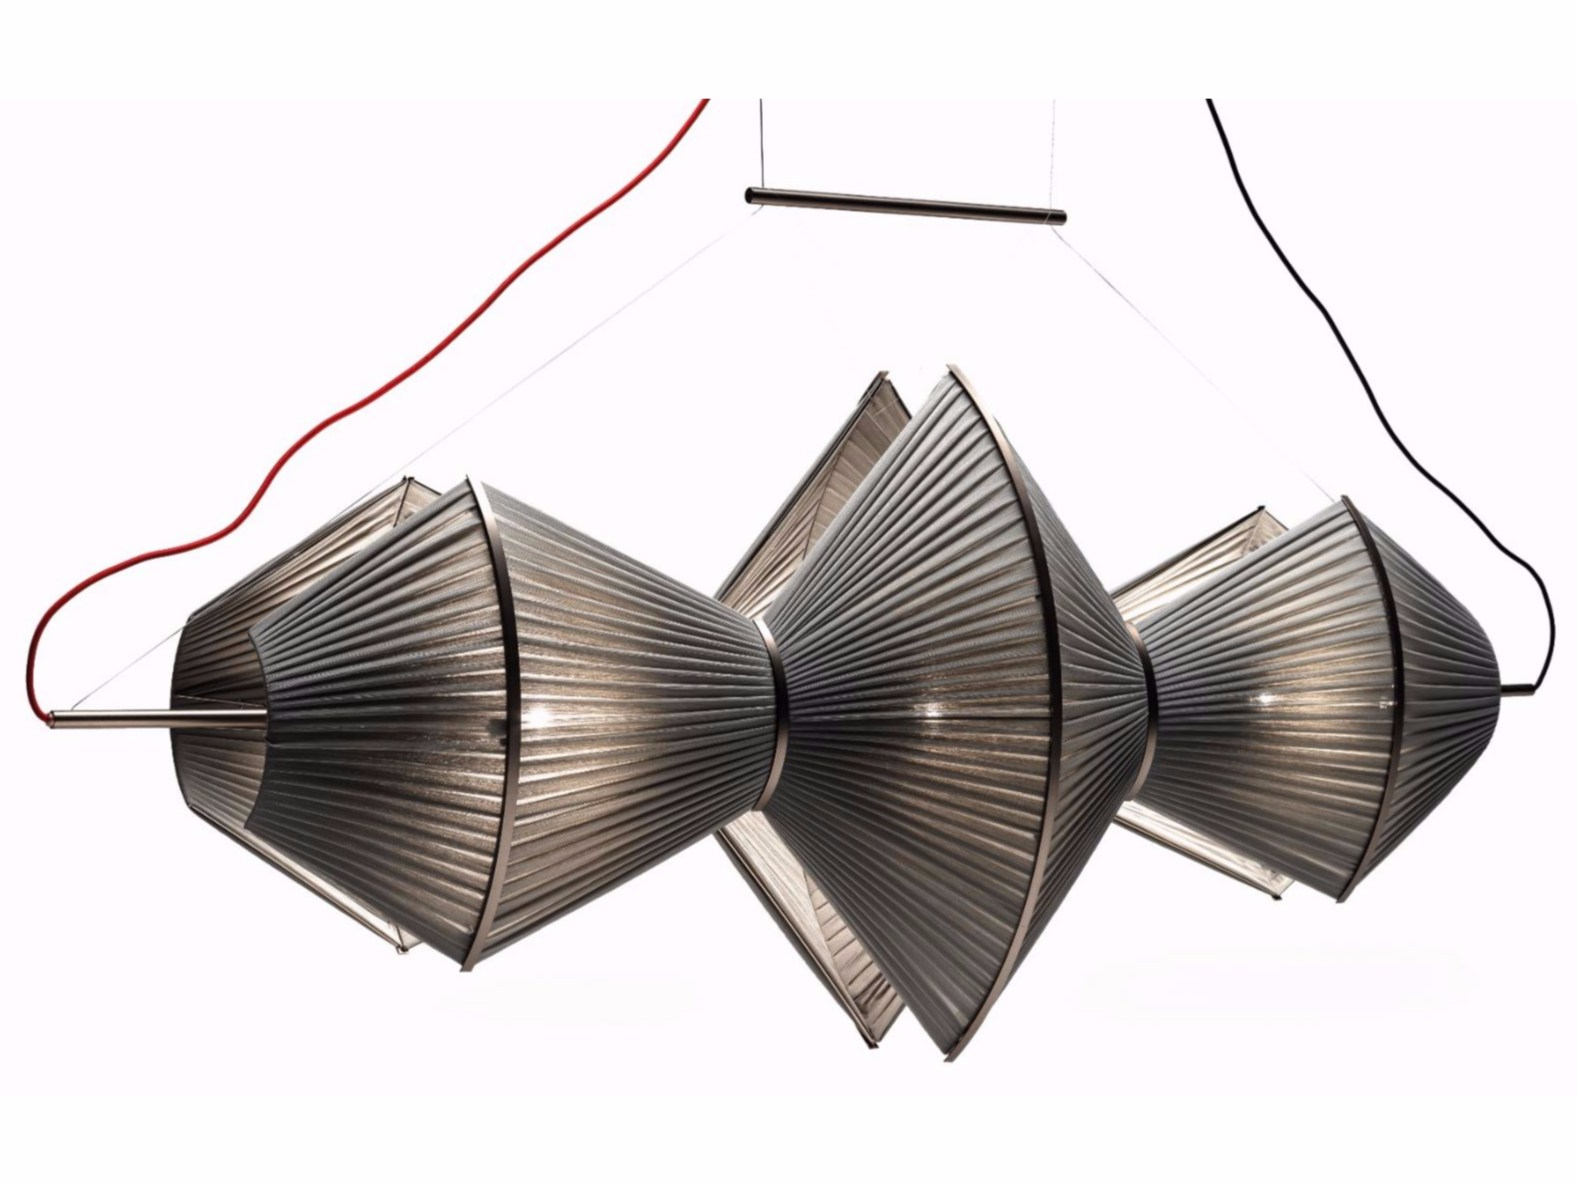 bug-pendant-lamp-arketipo7E311A36-FD77-C7BE-ACF2-619771150A0E